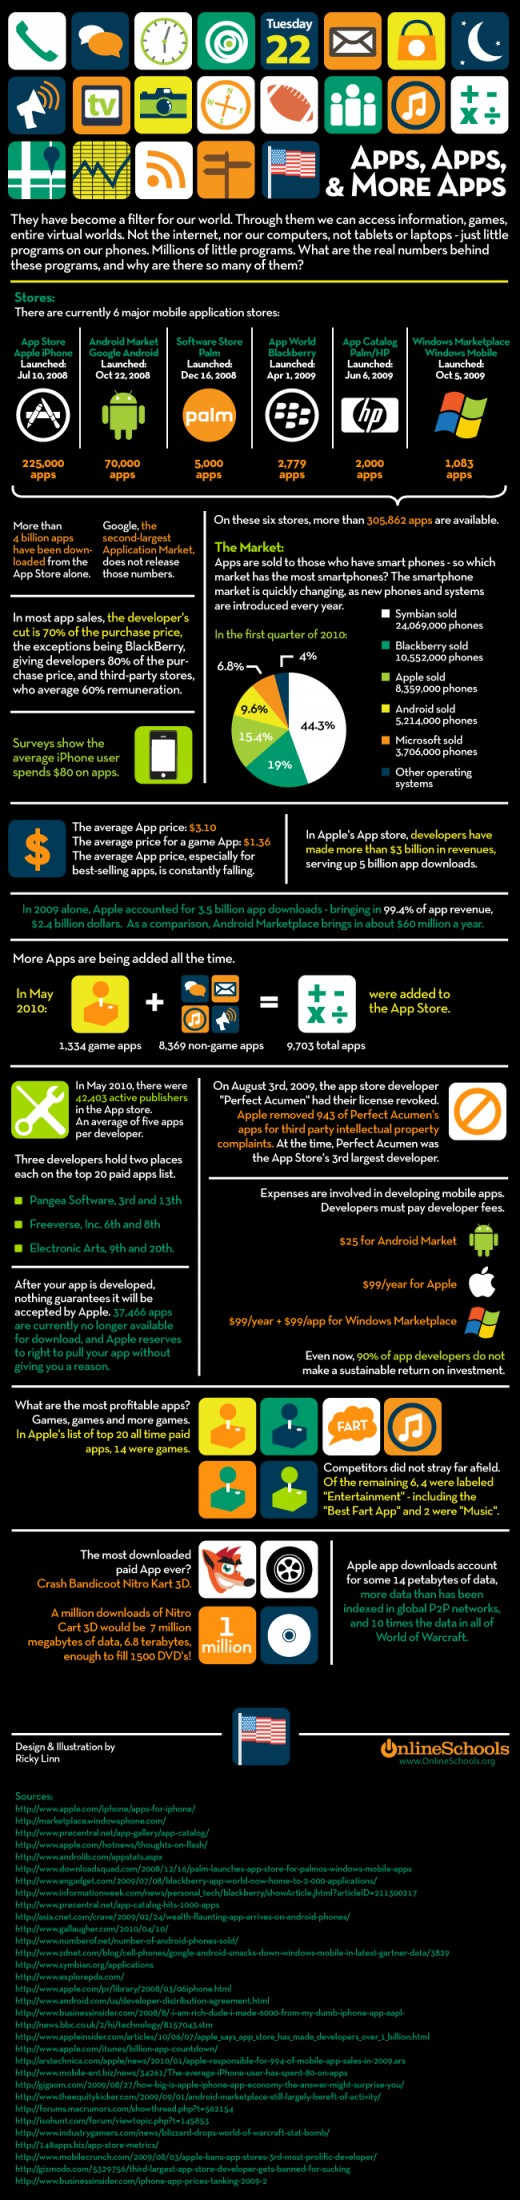 Aplicaciones, aplicaciones y más aplicaciones 1